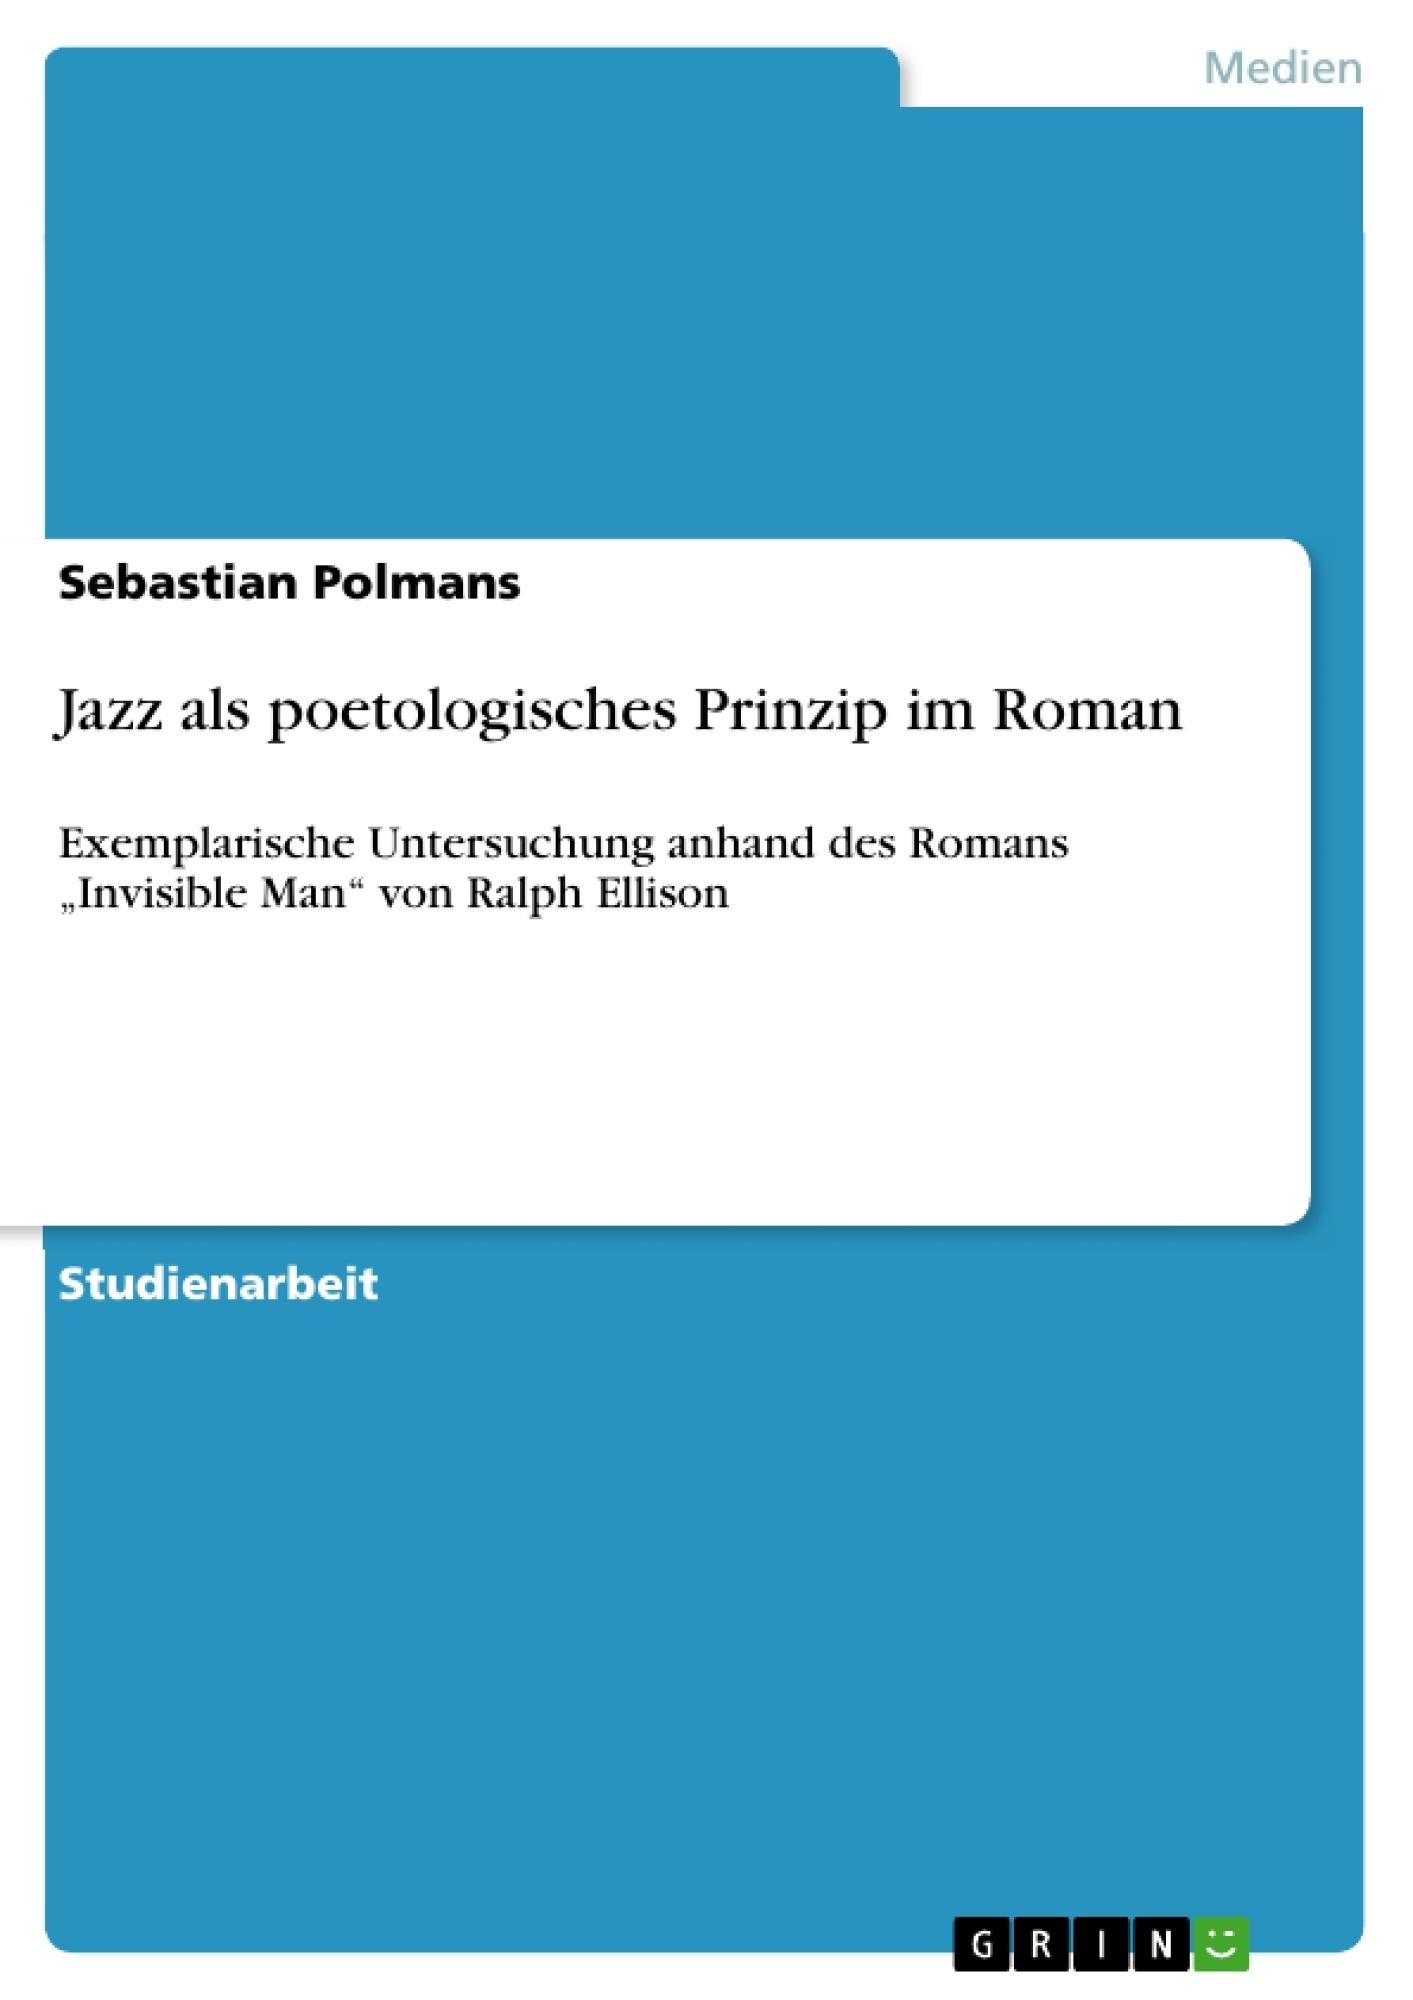 Titel: Jazz als poetologisches Prinzip im Roman